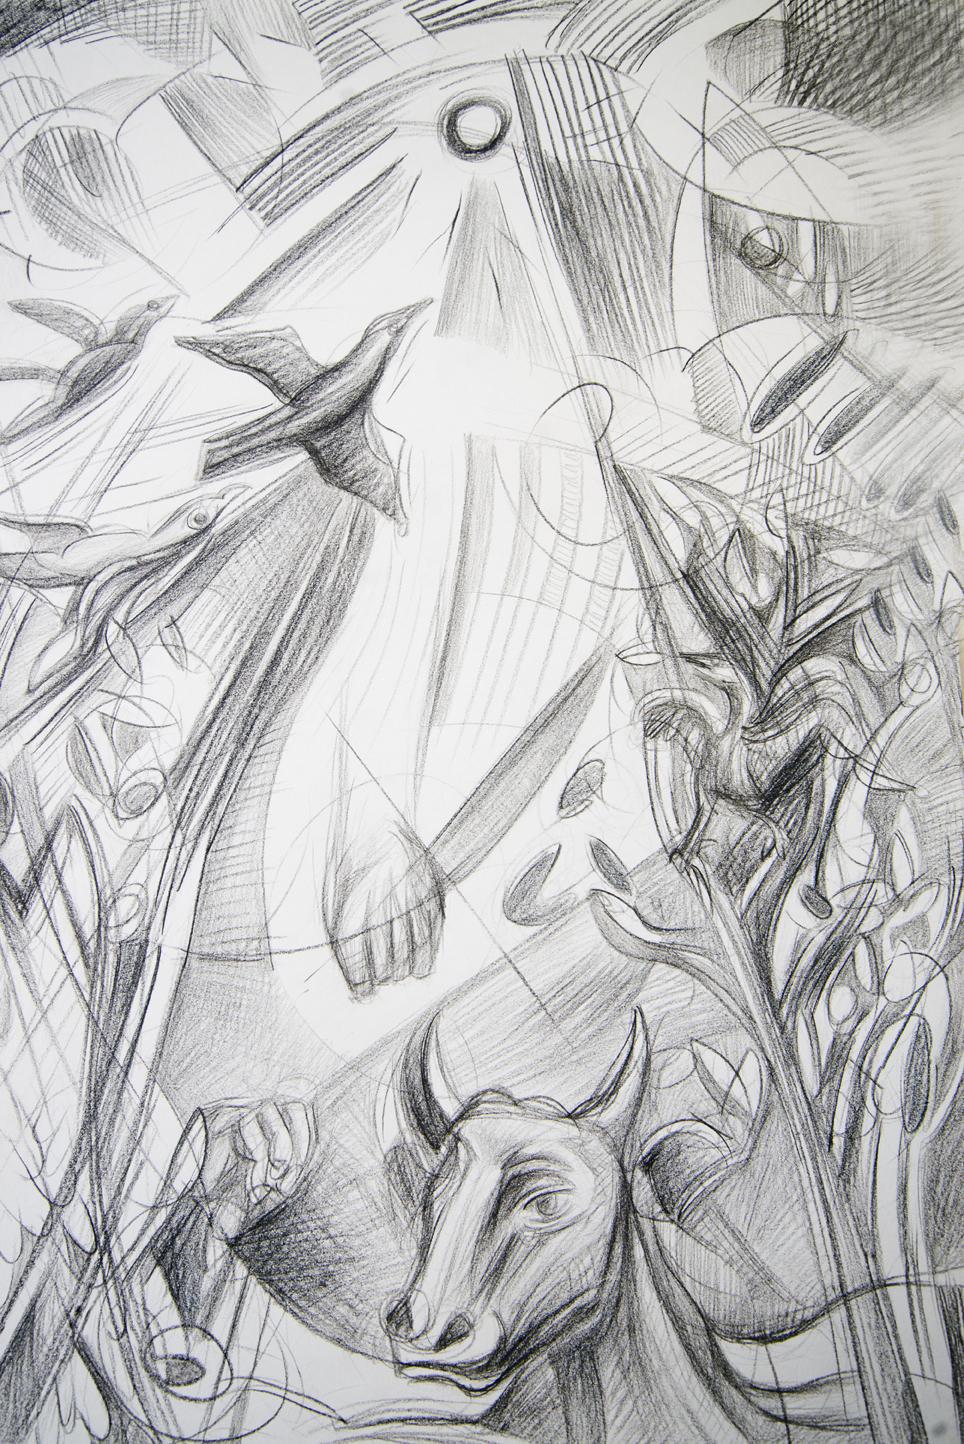 Dedalus and Minotaurus Study 6, 2015